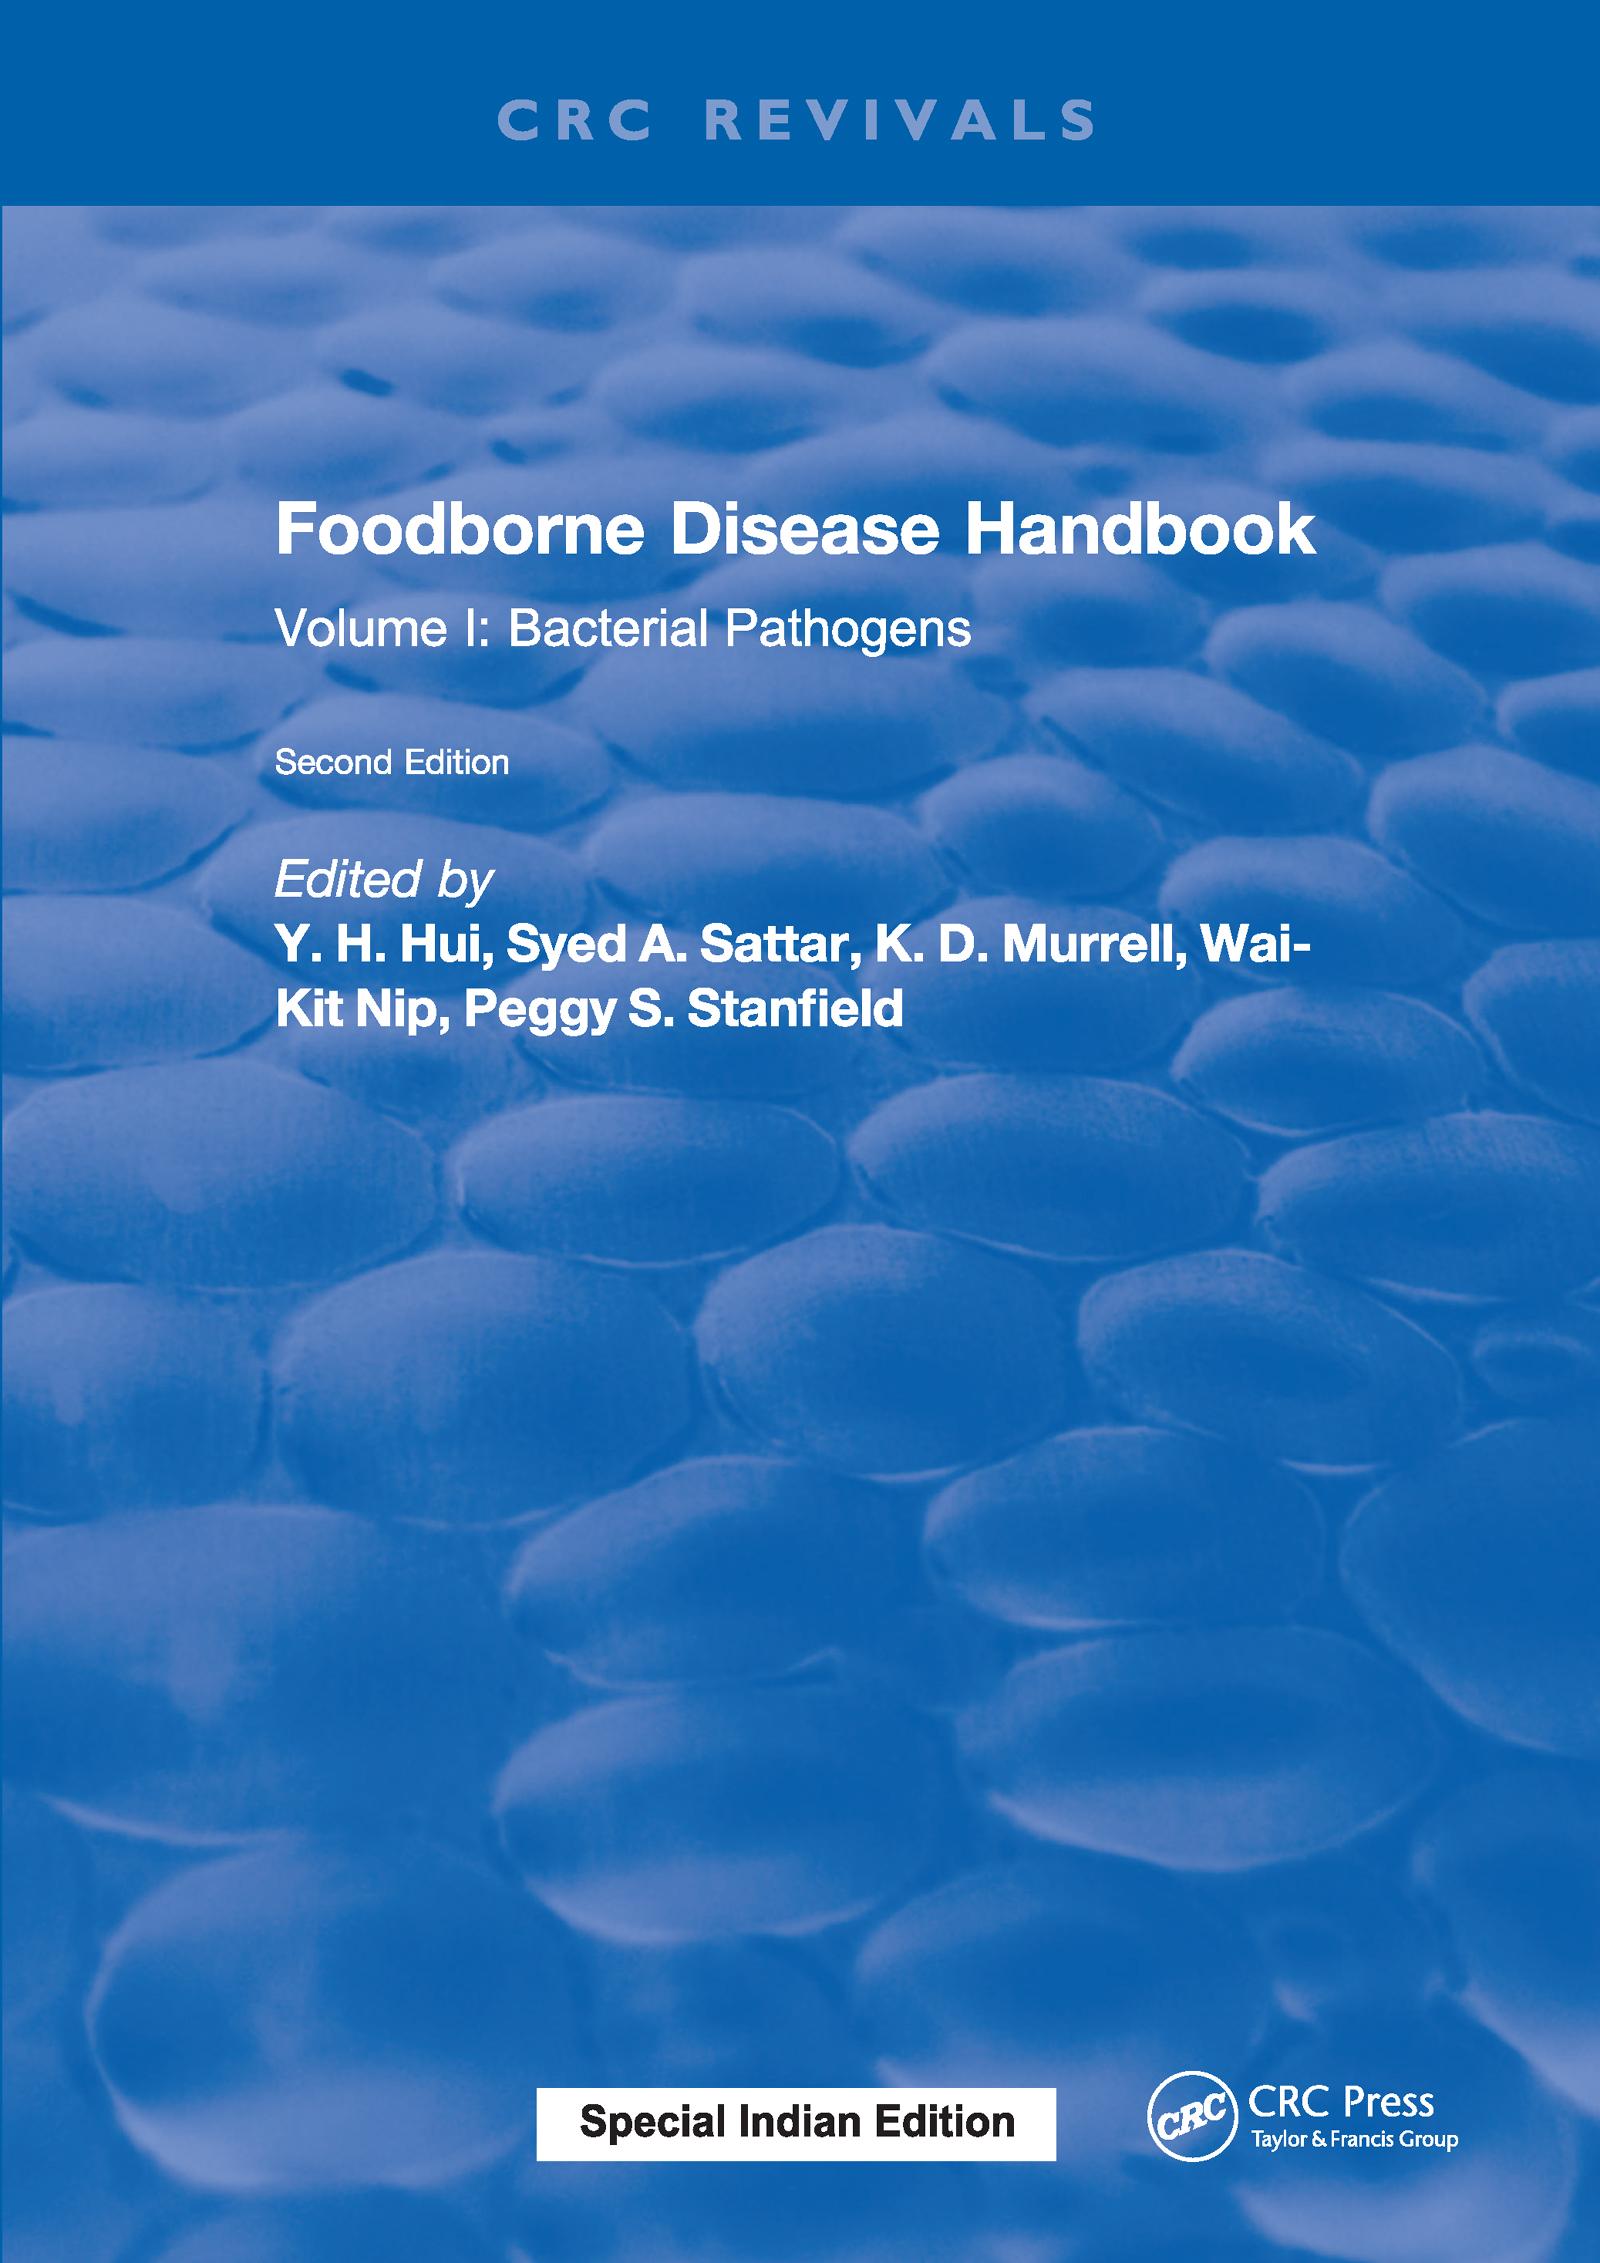 Foodborne Disease Handbook, Second Edition: Volume I: Bacterial Pathogens, 2nd Edition (Hardback) book cover